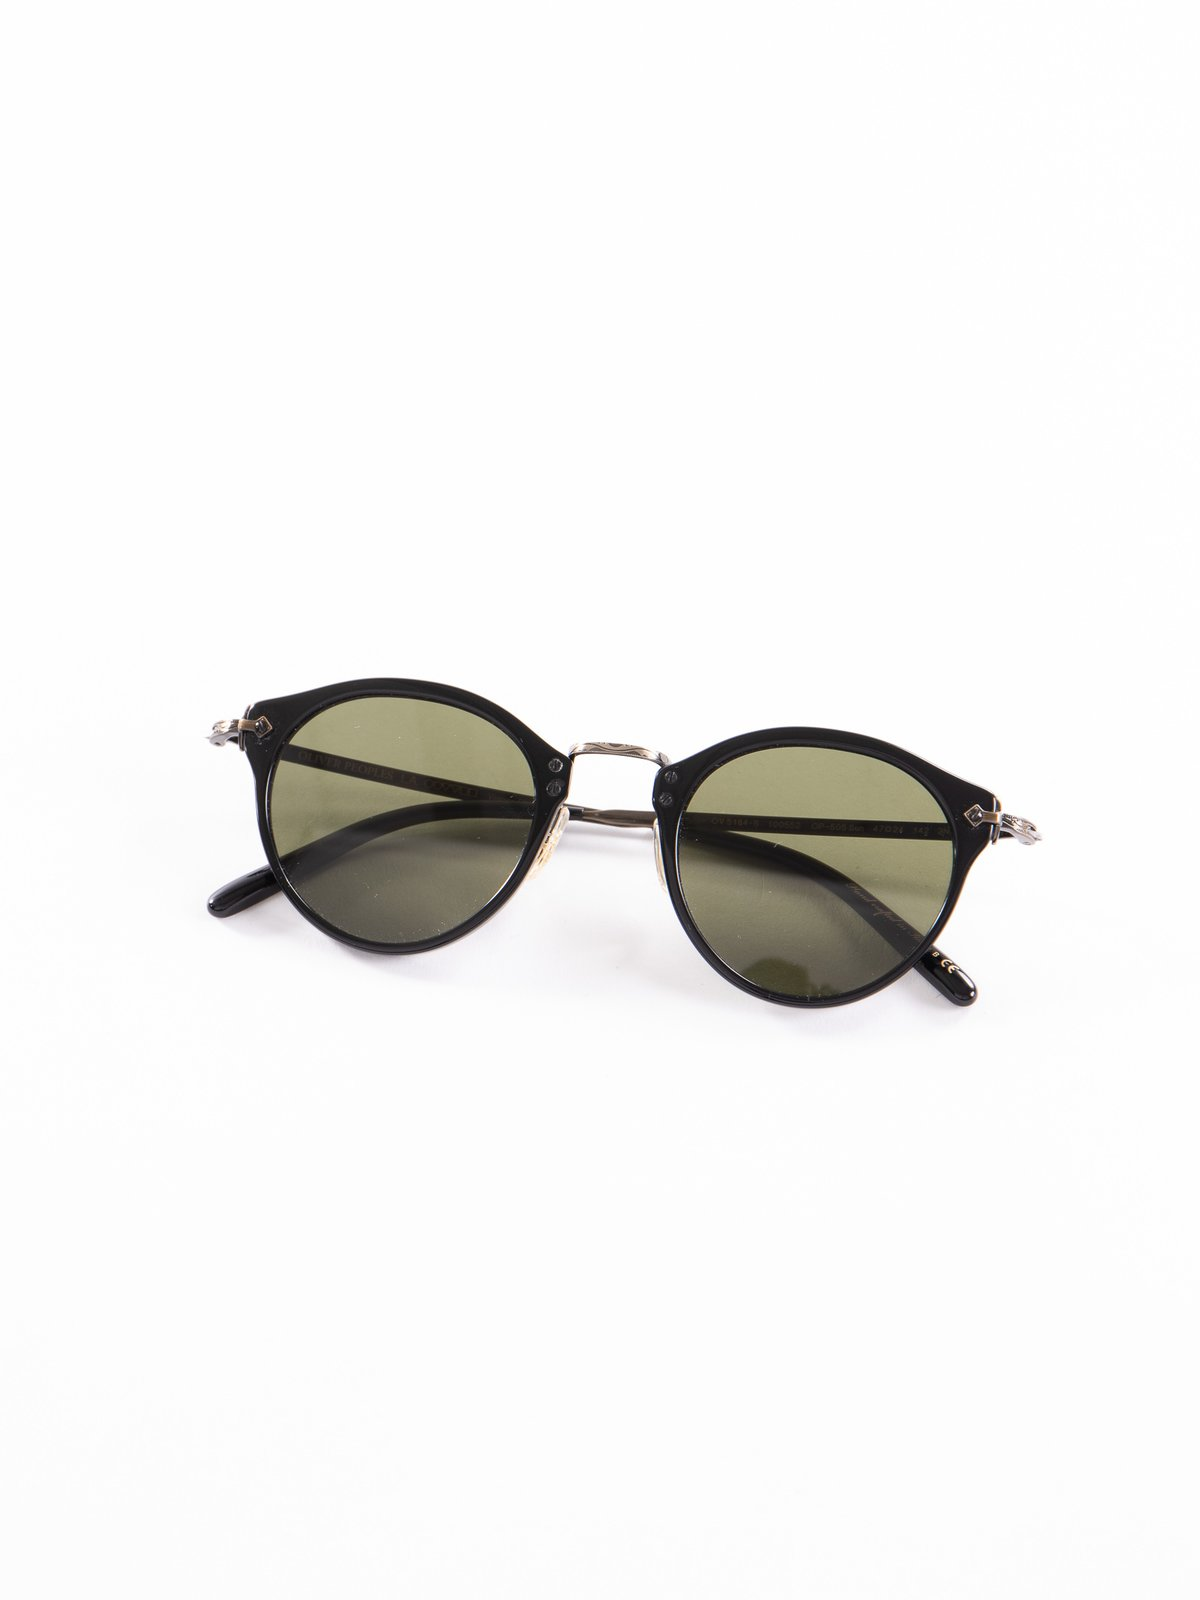 Black–Antique Gold/Green OP–505 Sunglasses - Image 1